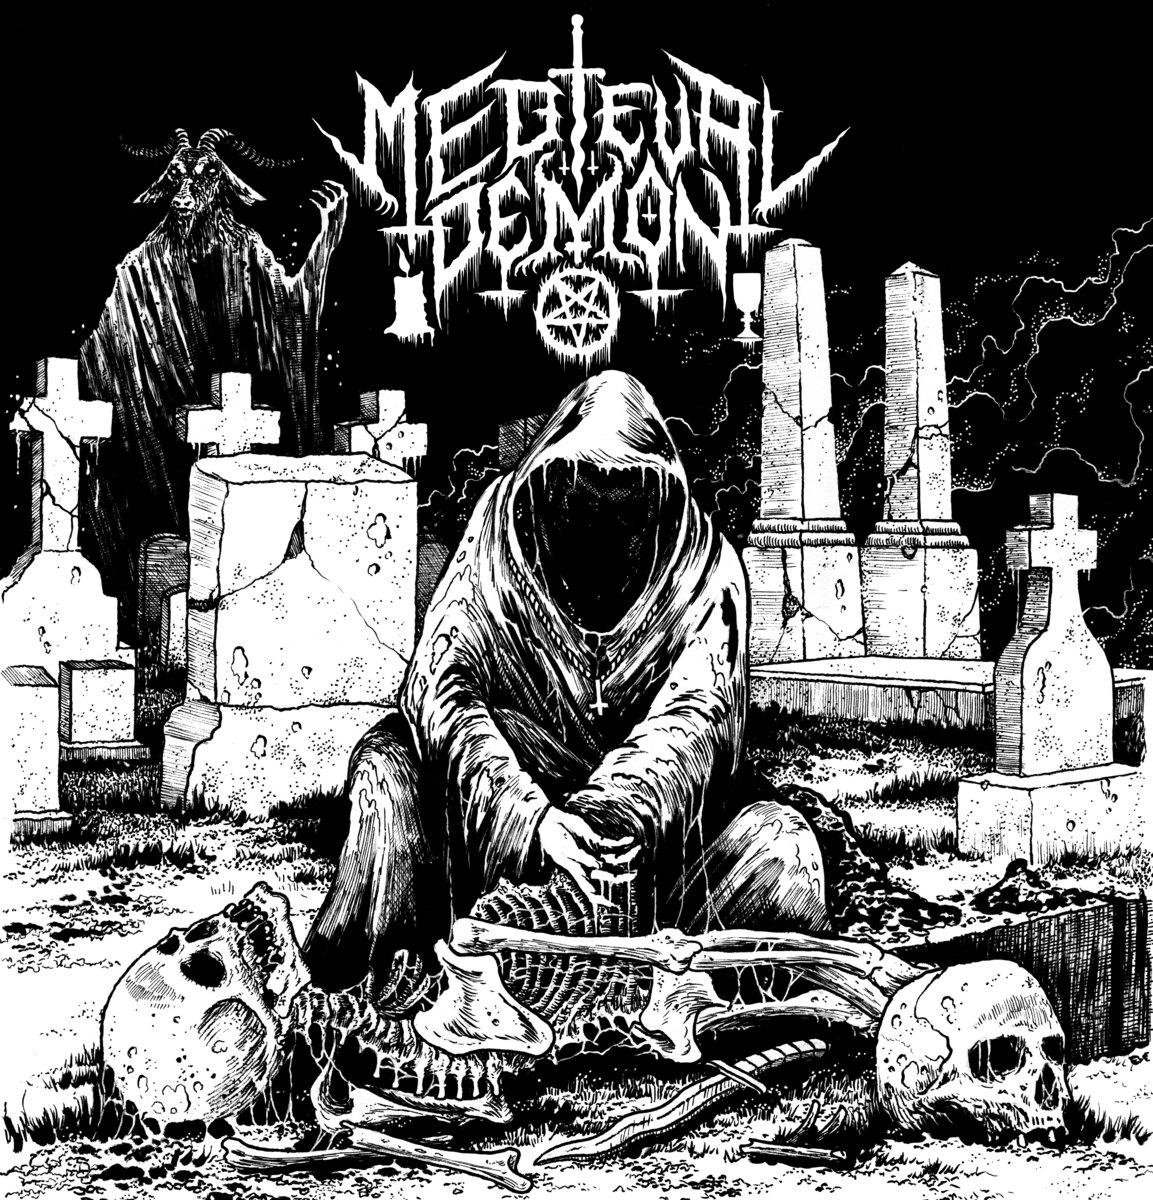 Medieval Demon Medieval Necromancy Cd Iron Pegasus Records